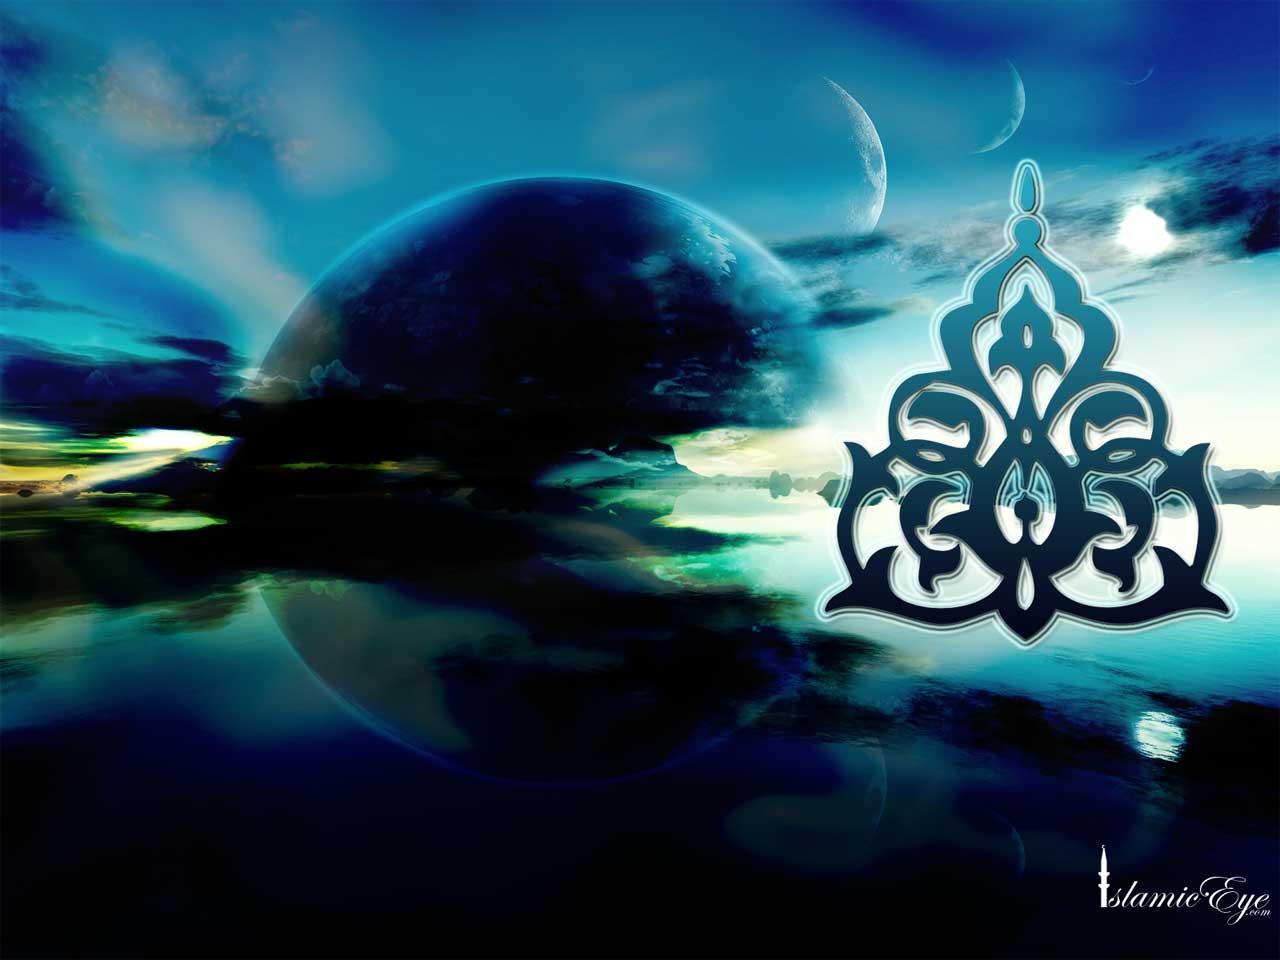 49 3d islamic wallpaper desktop wallpapers on wallpapersafari - La ilaha illallah hd wallpaper ...